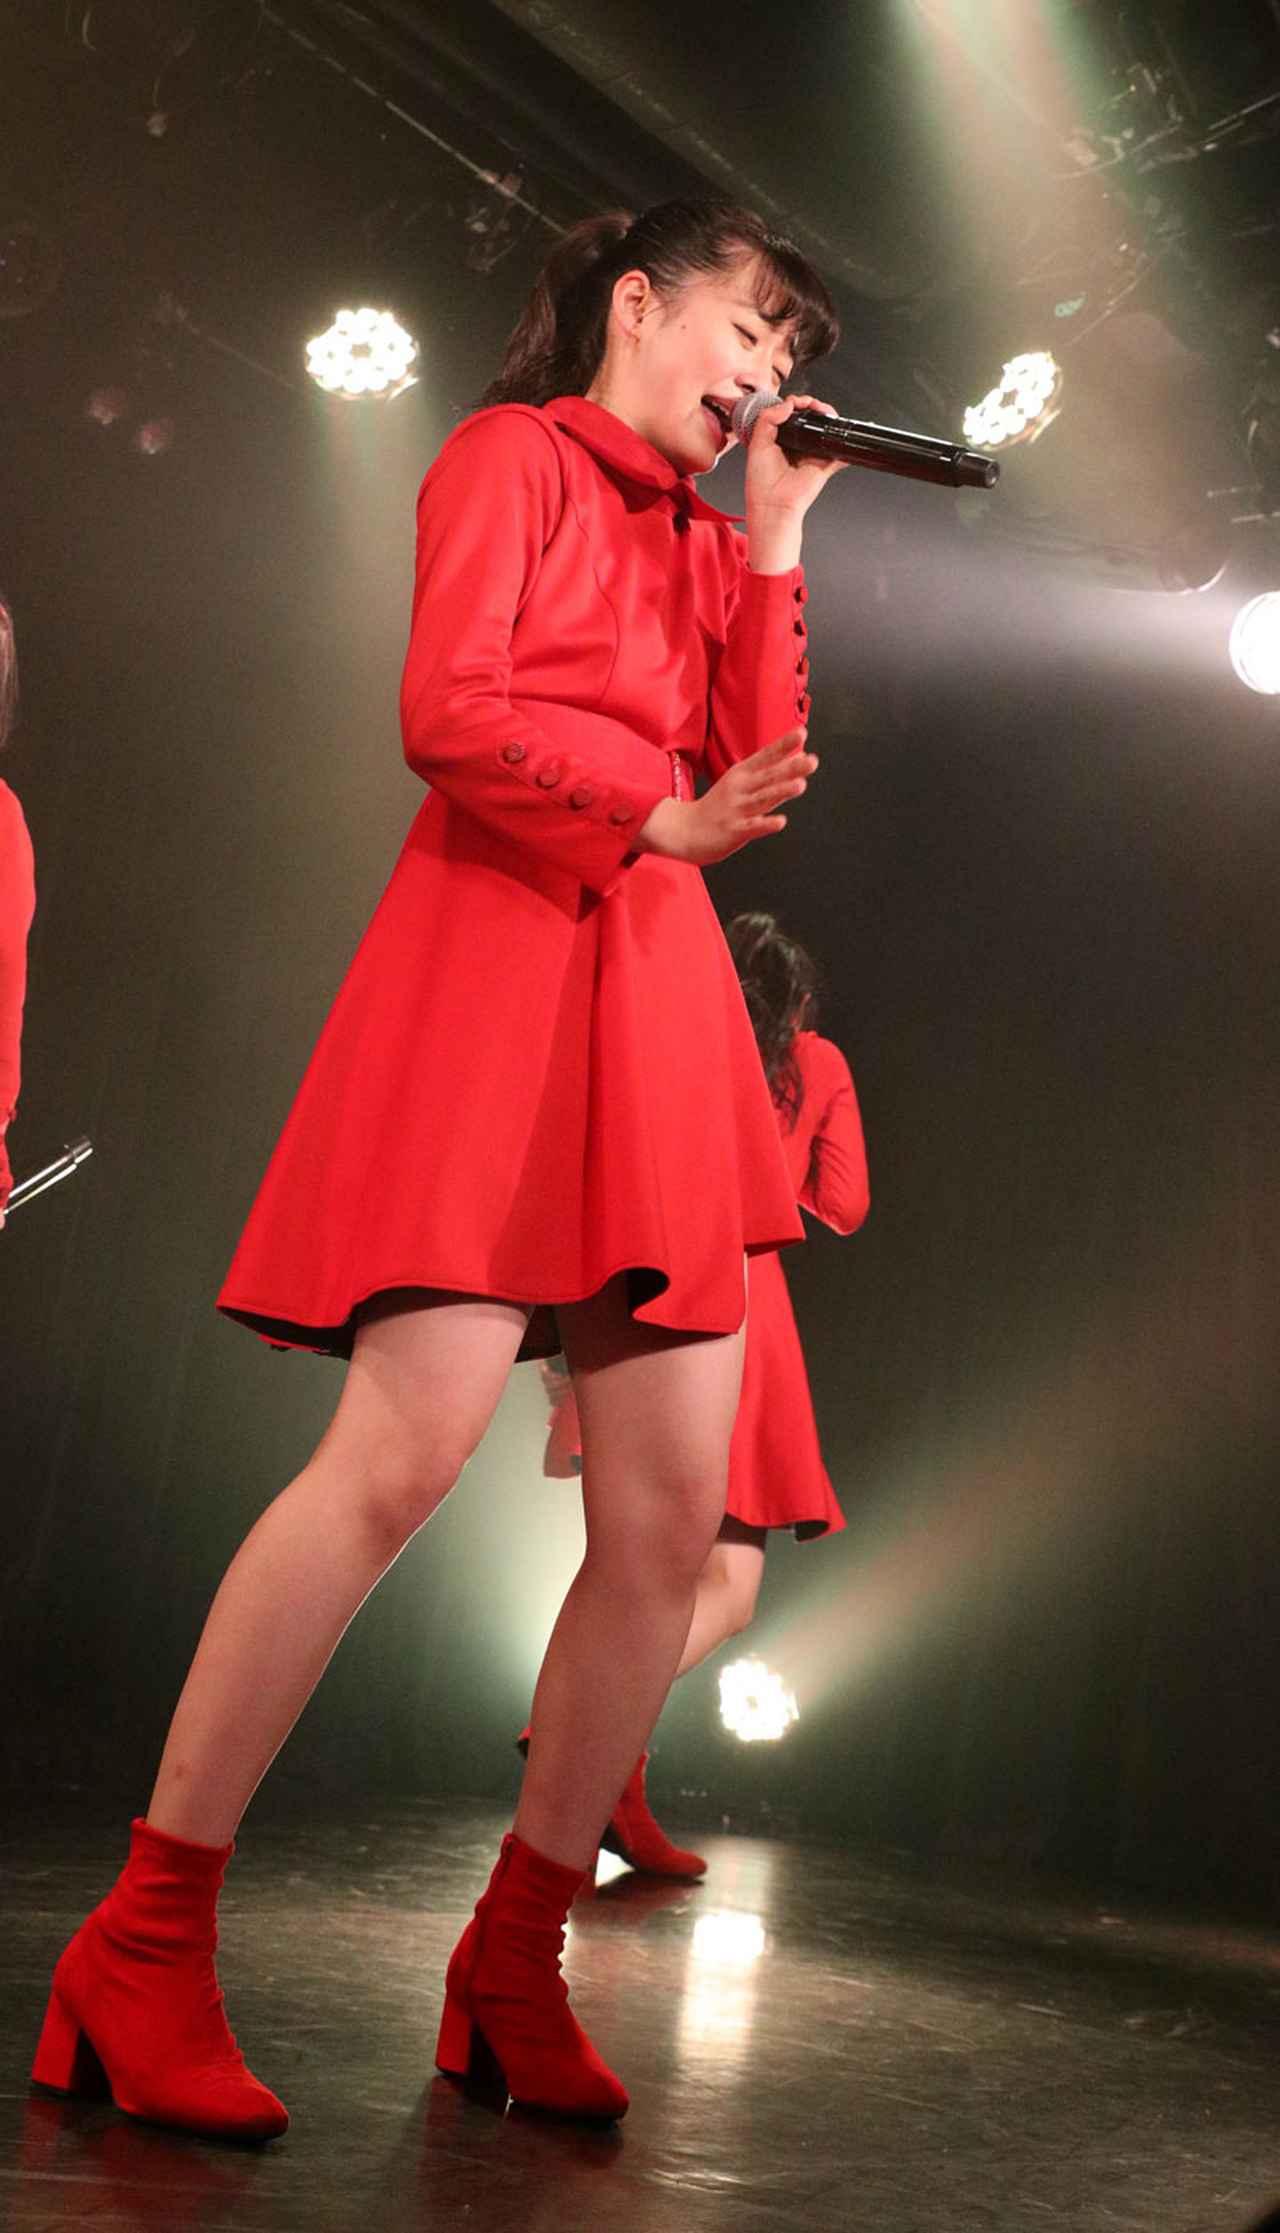 Images : 10番目の画像 - 「九州女子翼/TIF出場も決まって乗りに乗るグループが、初の東京定期公演をAKIBAカルチャーズ劇場で開催! 地元と変わらぬ熱いステージを構築!!」のアルバム - Stereo Sound ONLINE